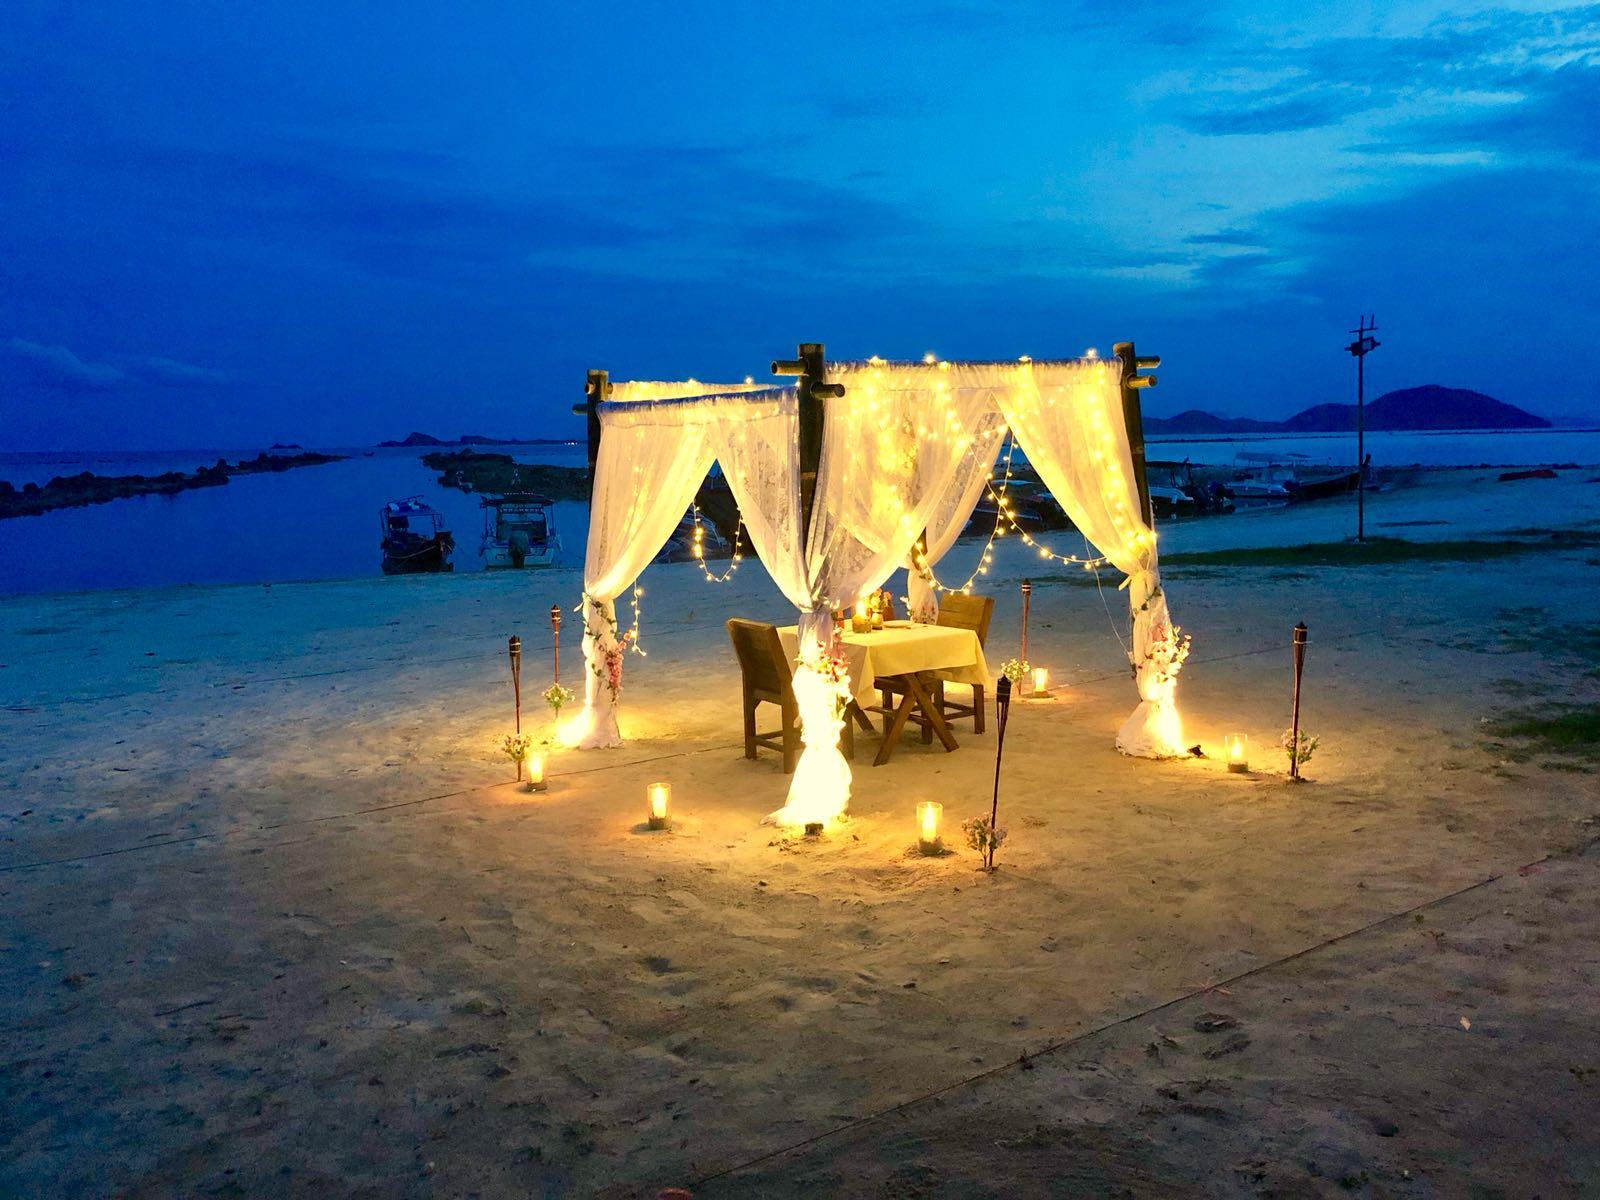 Romantic speedboat cruise with dinner on the beach, Koh Samui, Thailand